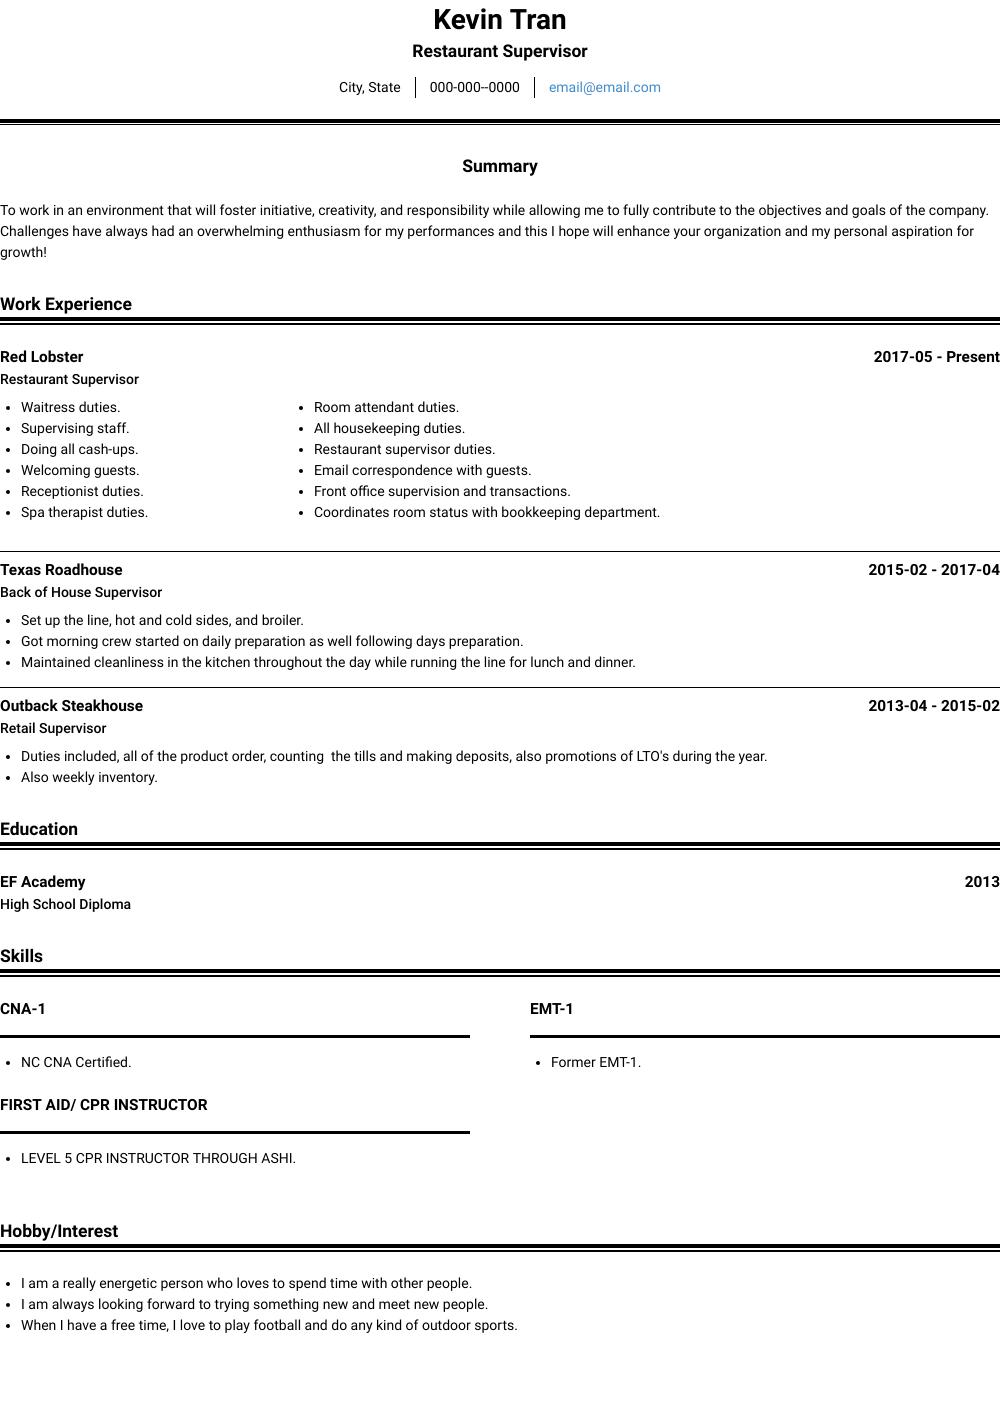 Restaurant Resume Samples Templates Visualcv